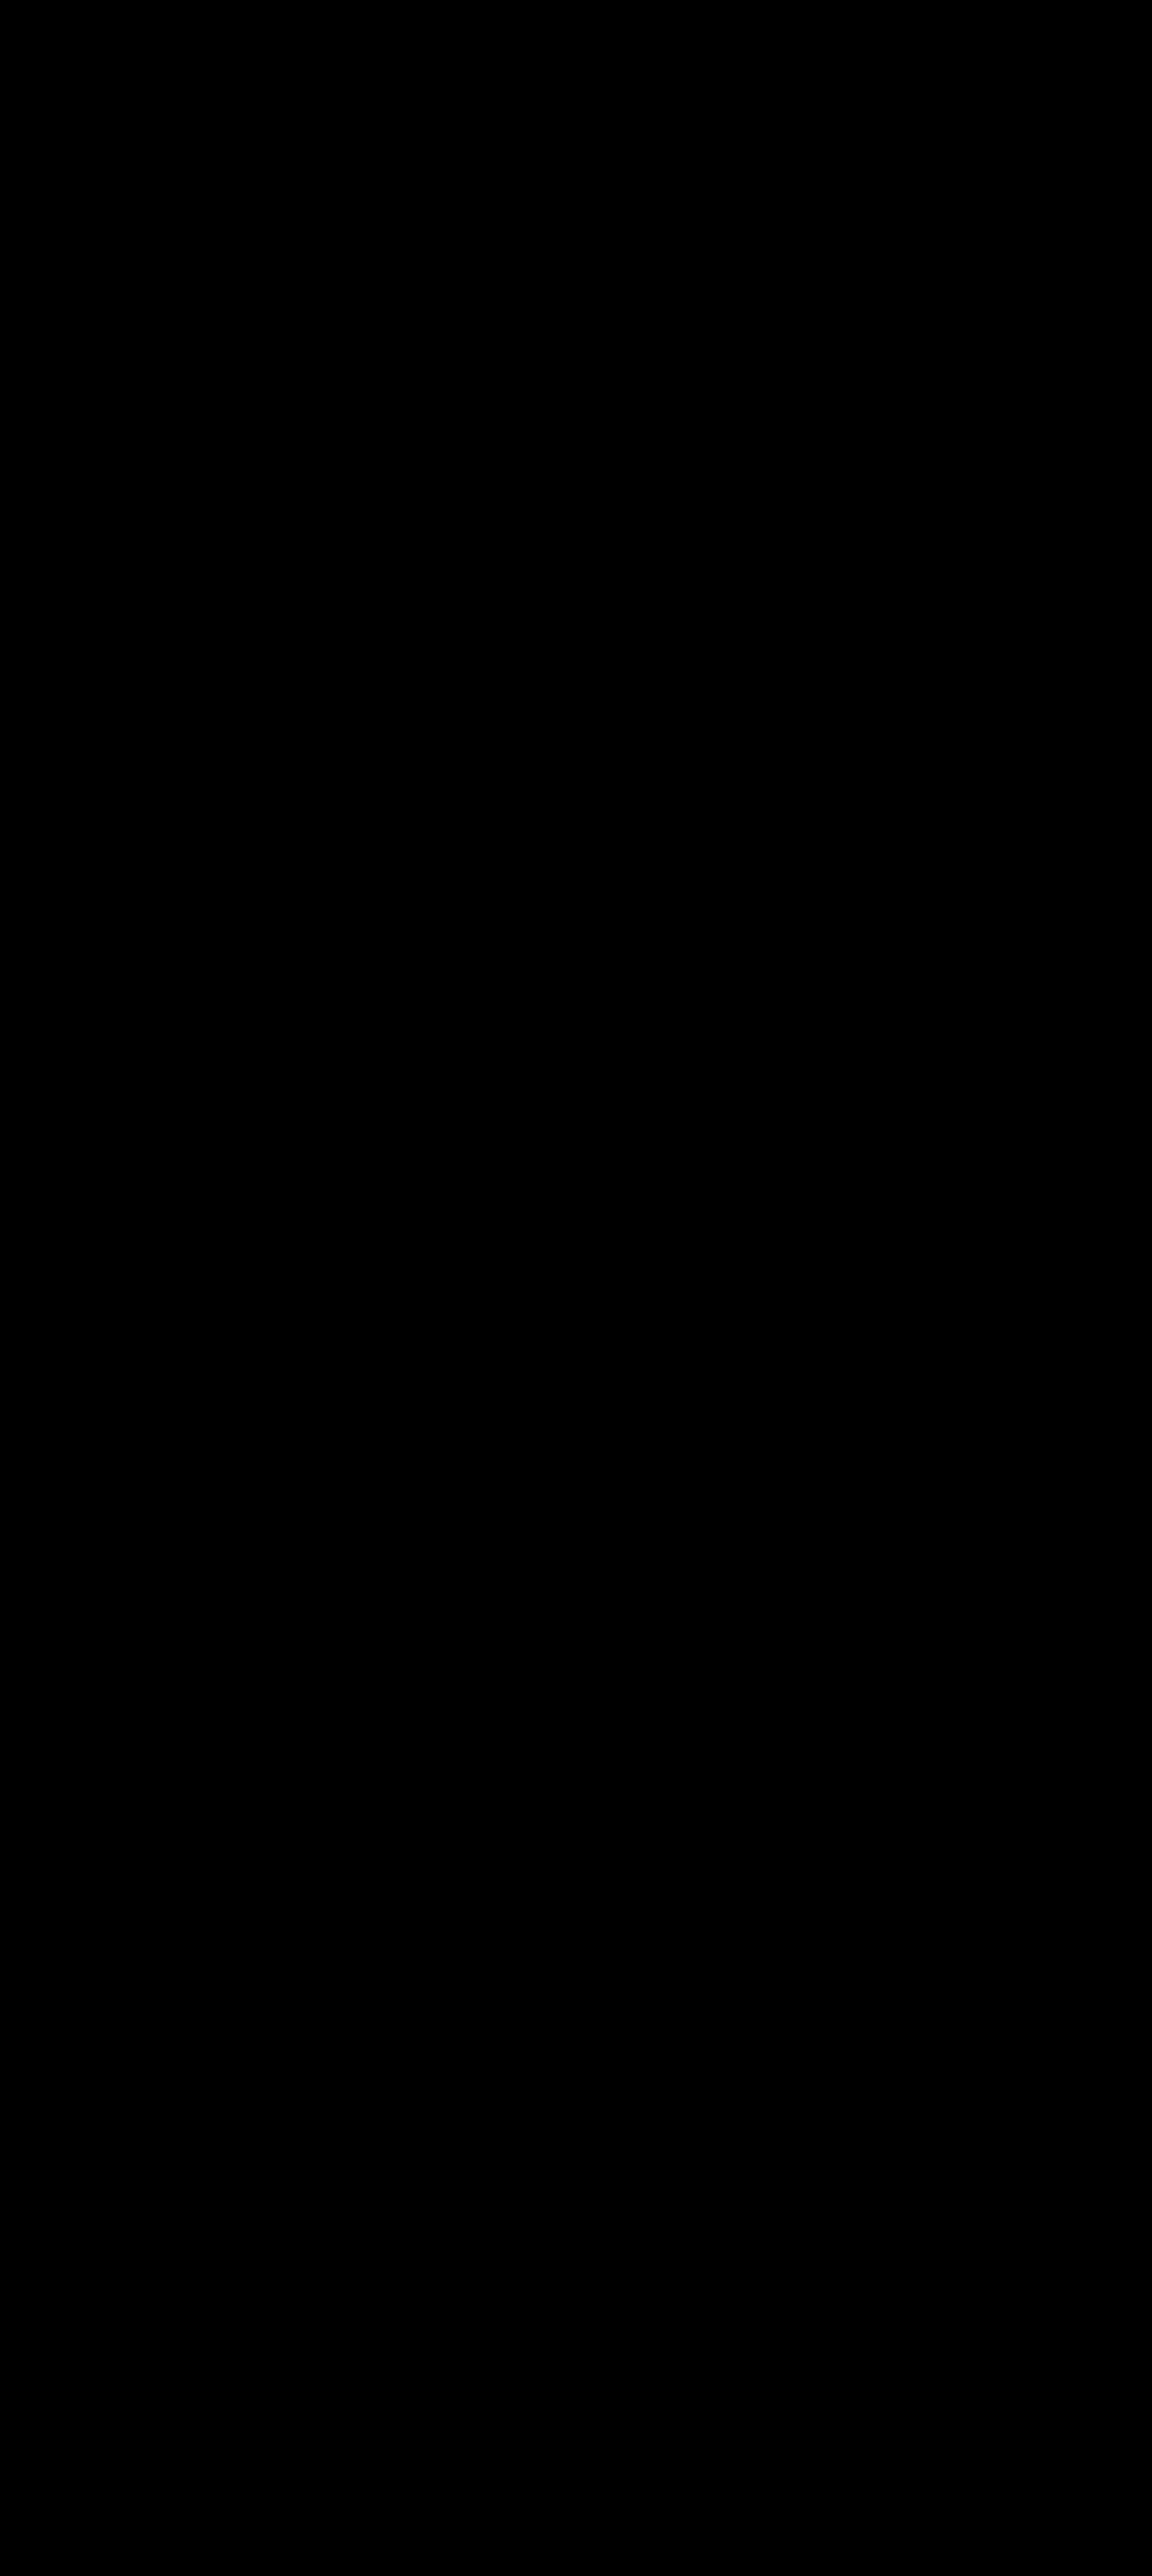 SUMO-Reward-Points-Settings-Dark